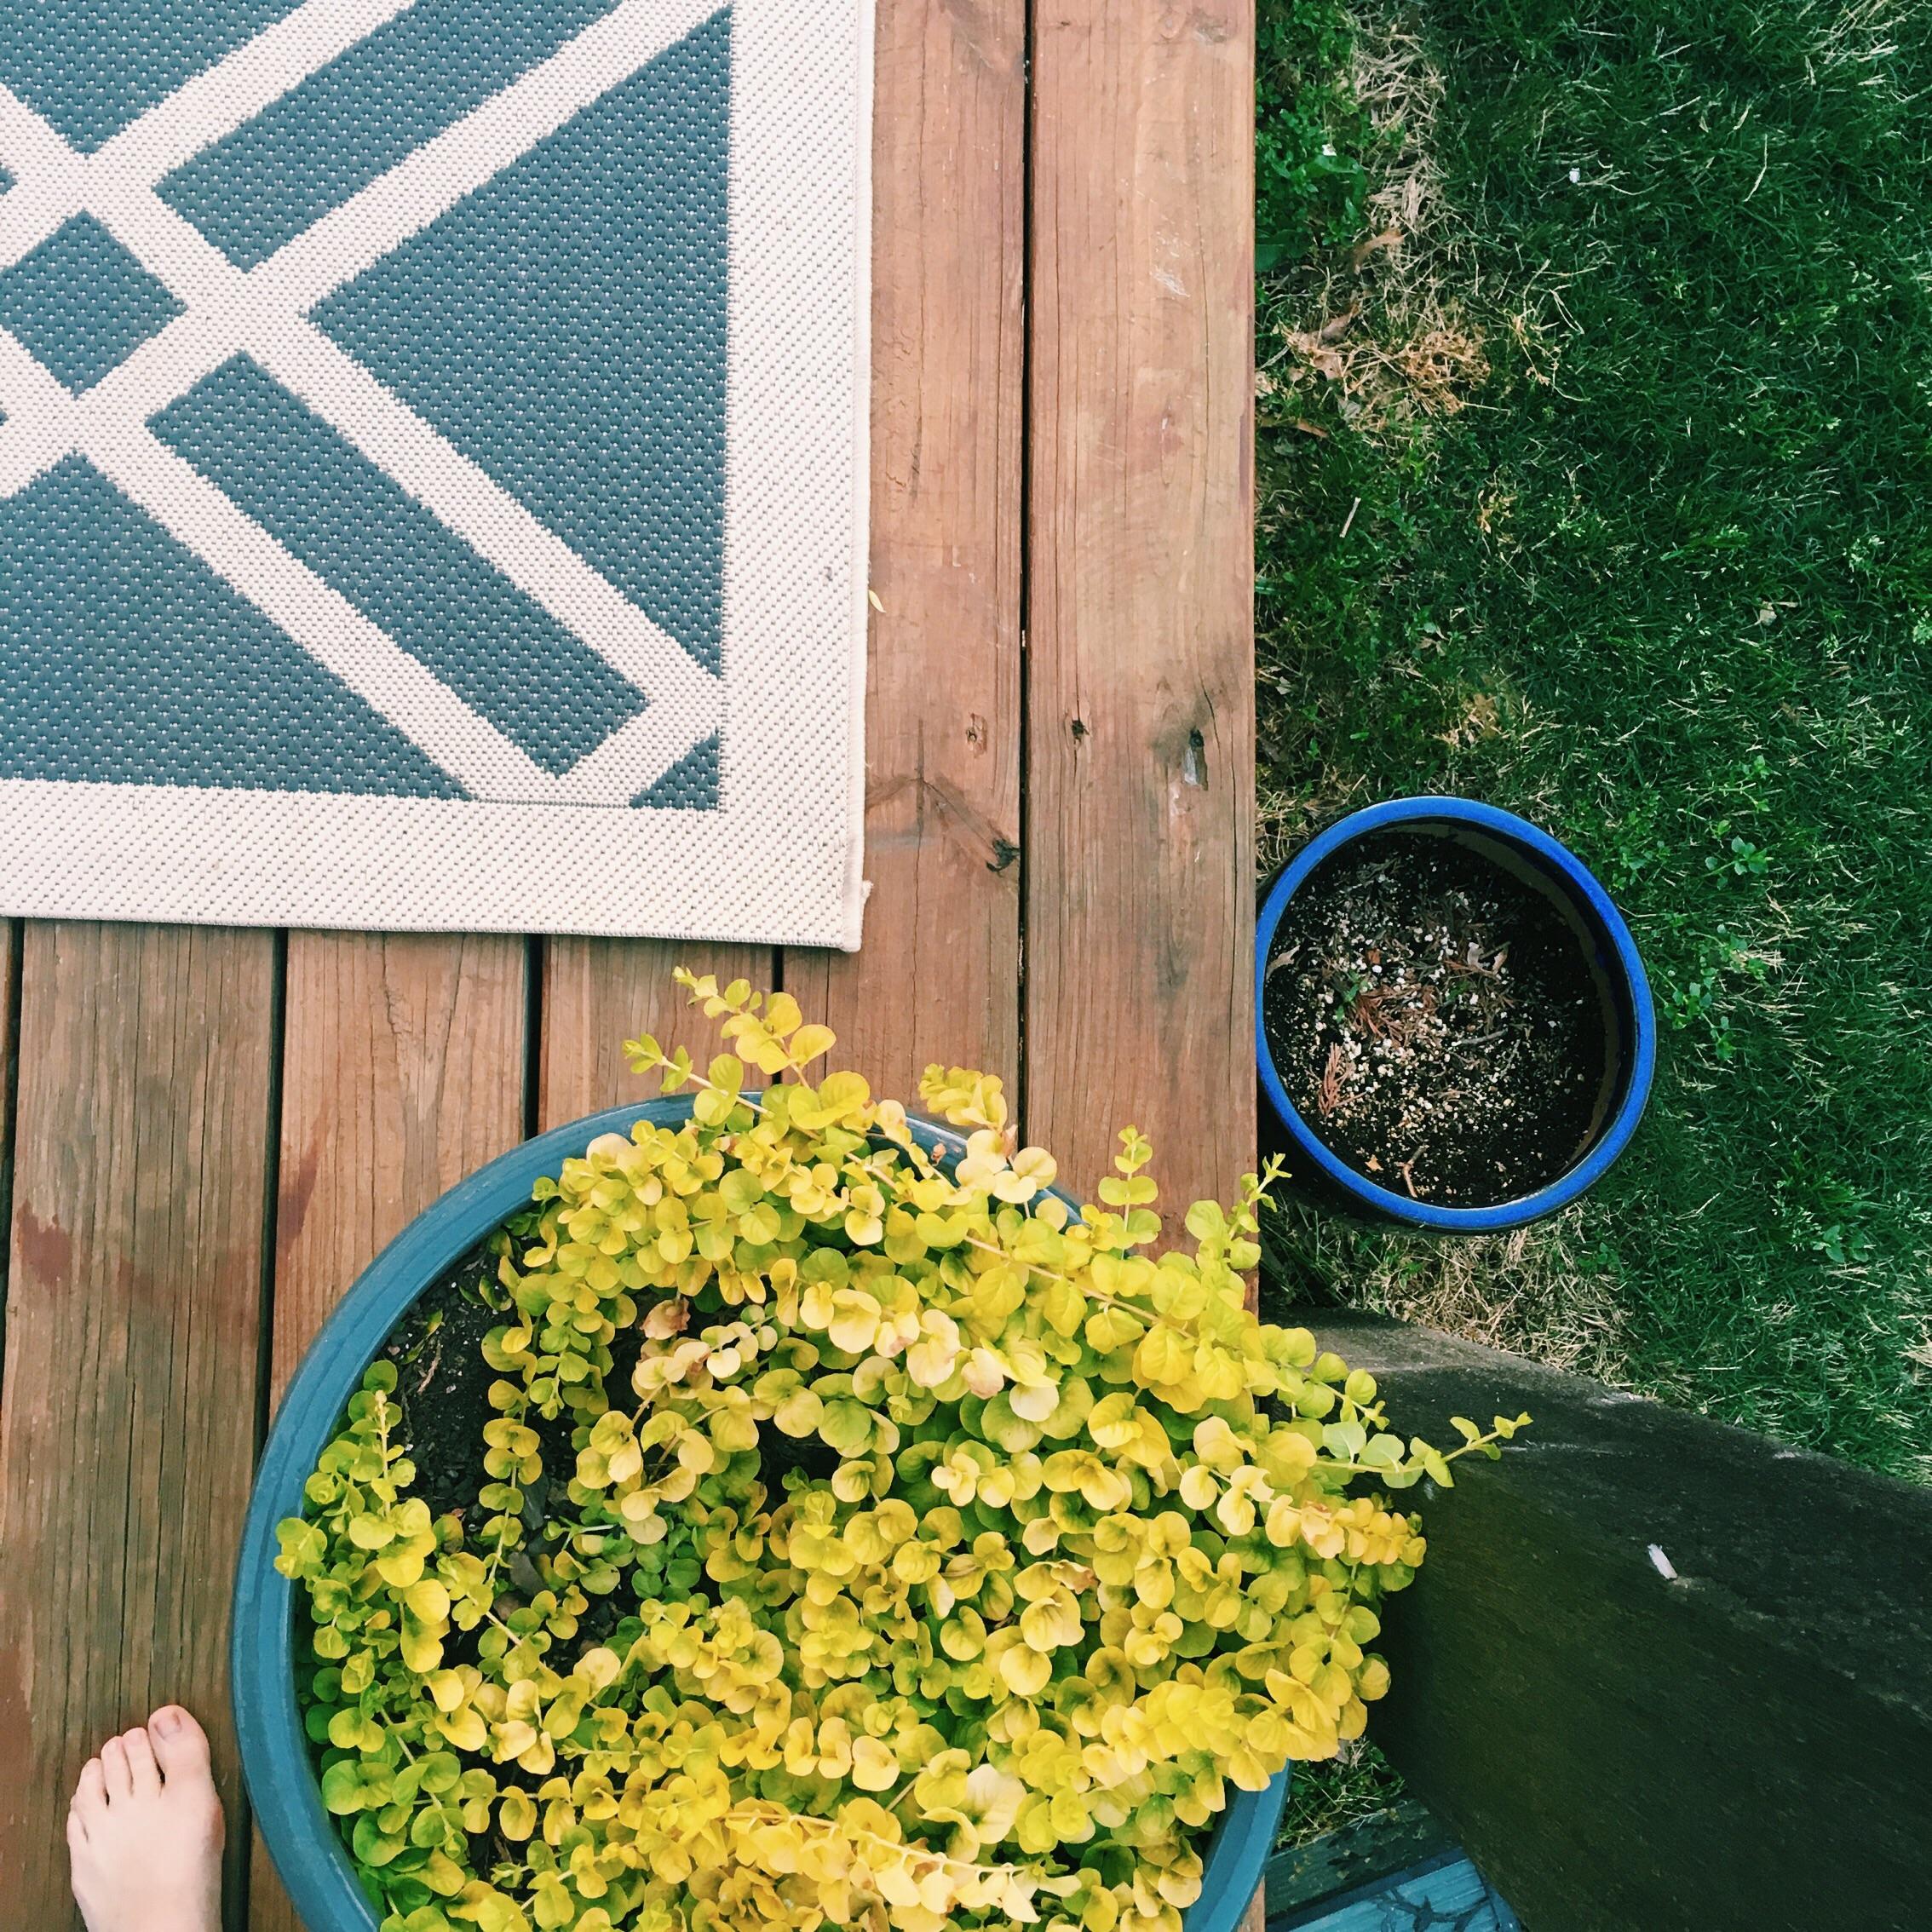 Thesmaller pot is true evidence of my gardening skills.